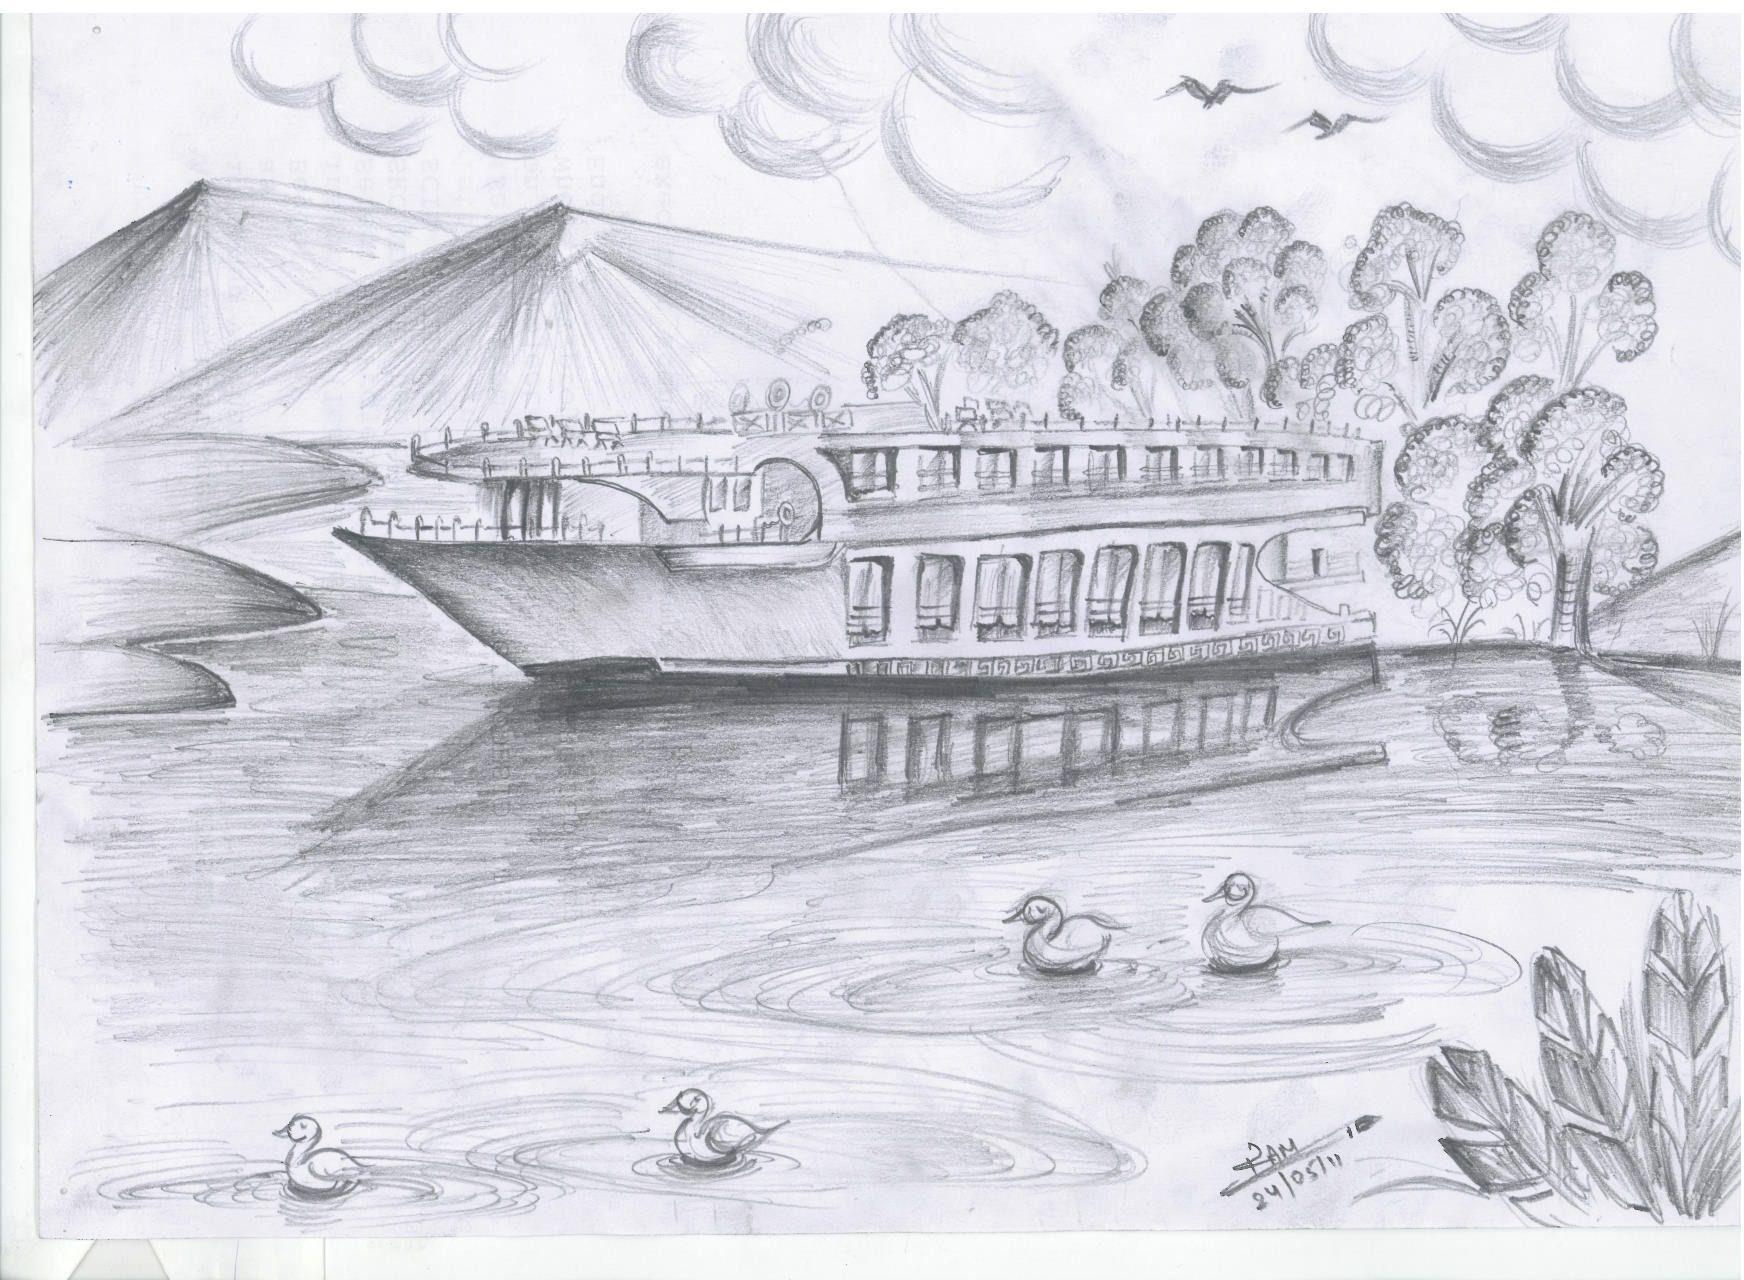 pencil drawing nature 27 hd image wallpaper | pencil drawings